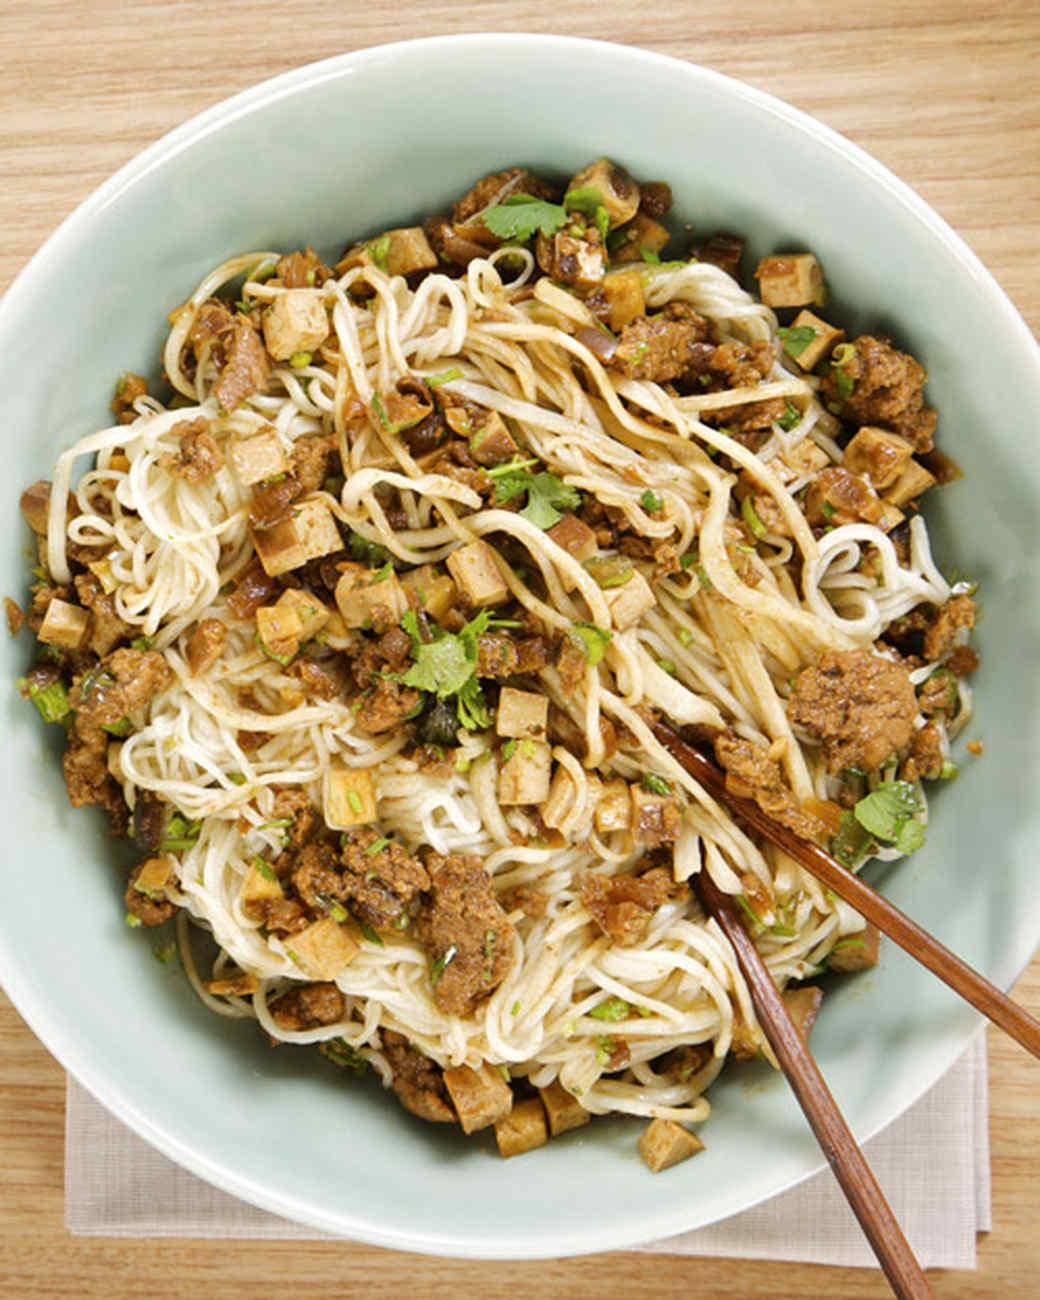 Lilly's Pork Noodles